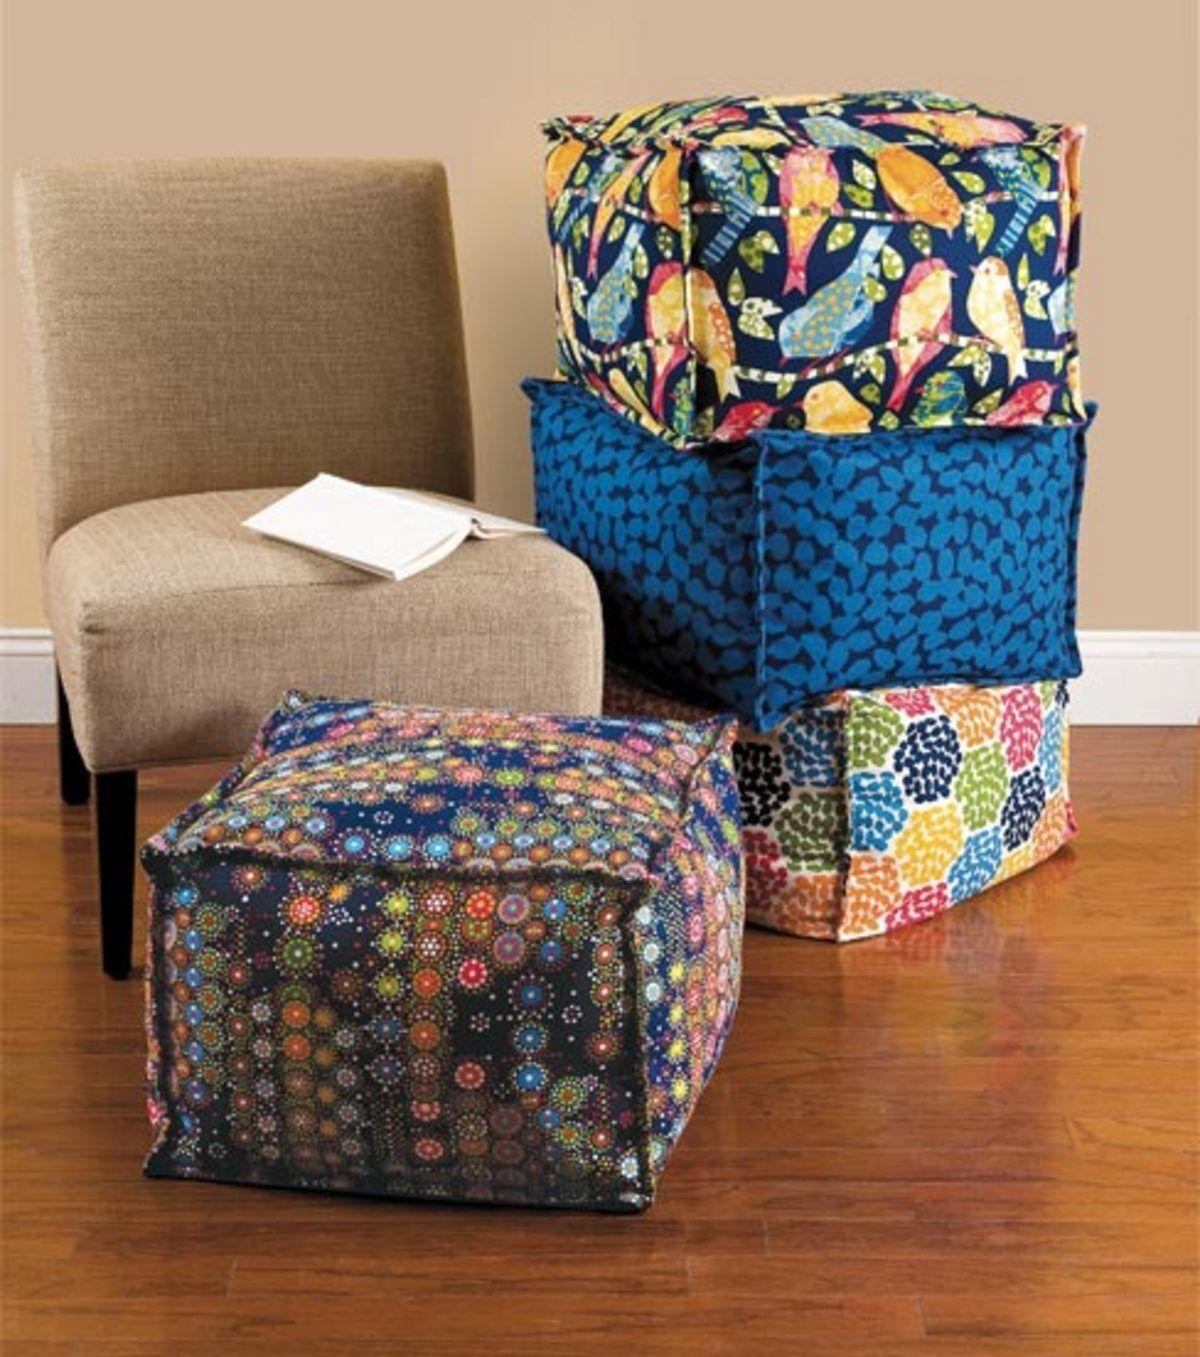 Cube Block Home Dec Pillows At Joann Com Diy Ottoman Kids Seating Fabric Decor